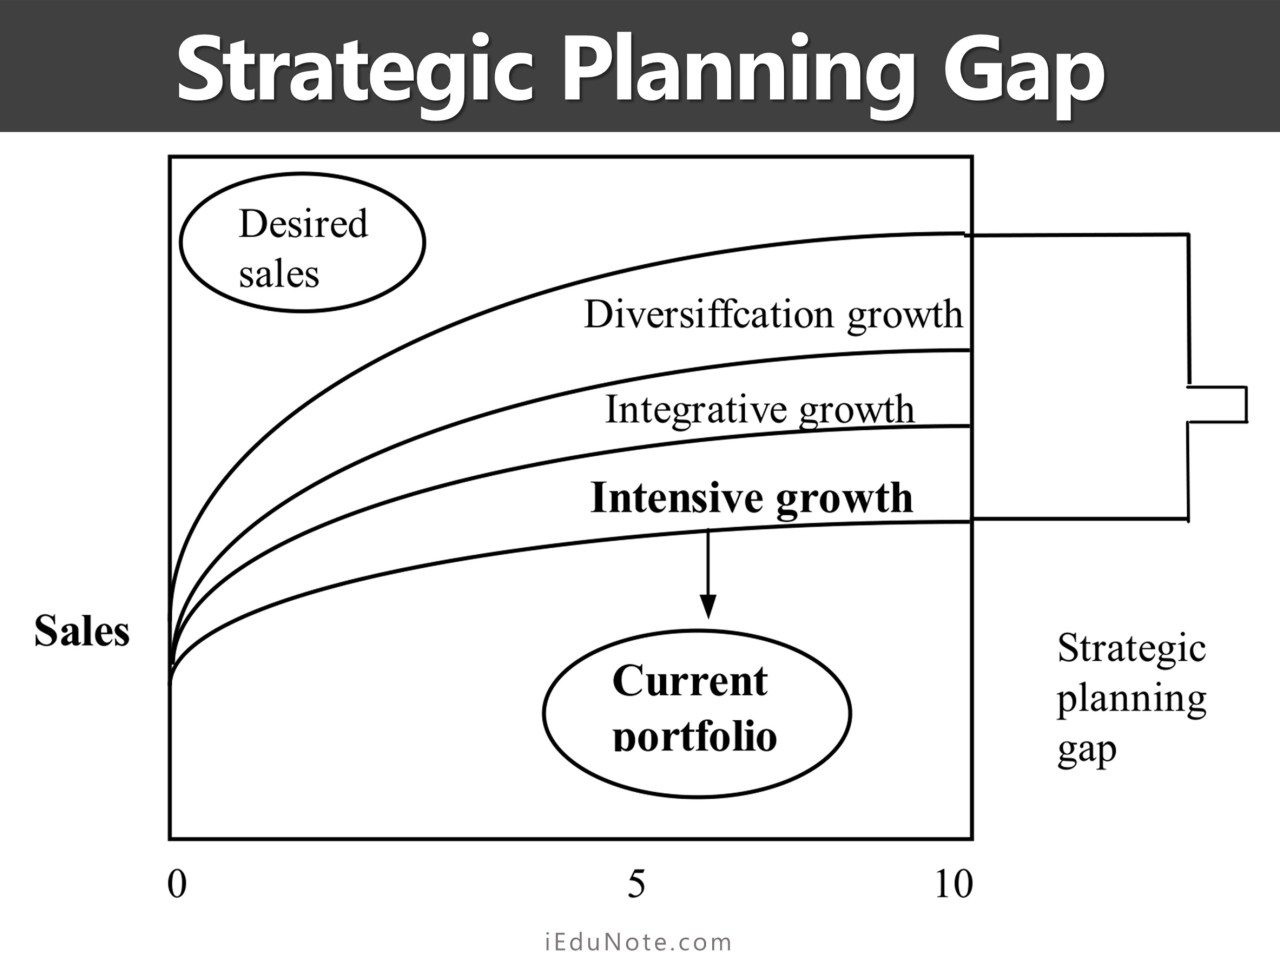 strategic planning gap three growth opportunities